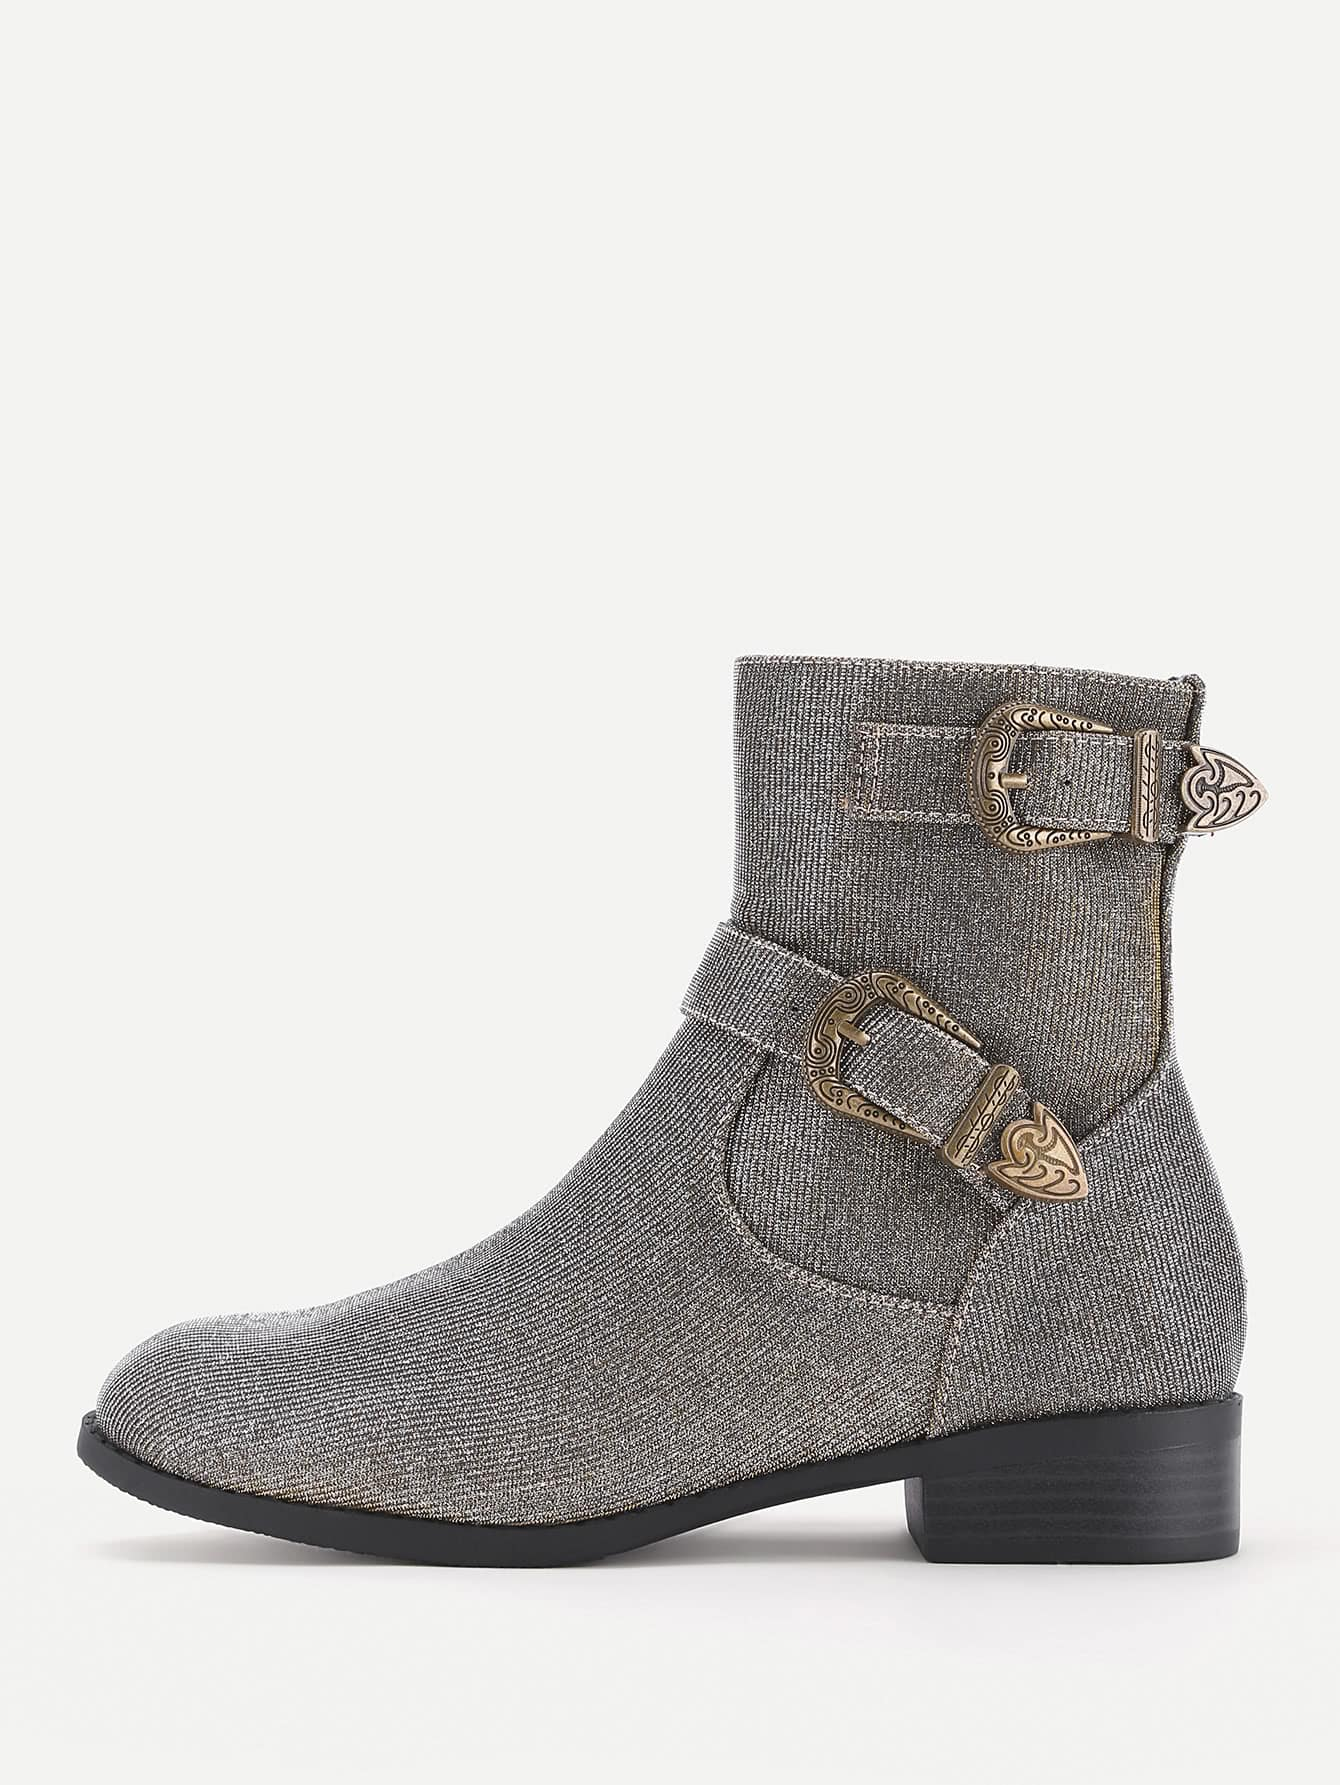 Side Zipper Buckle Belt Ankle Boots цена и фото